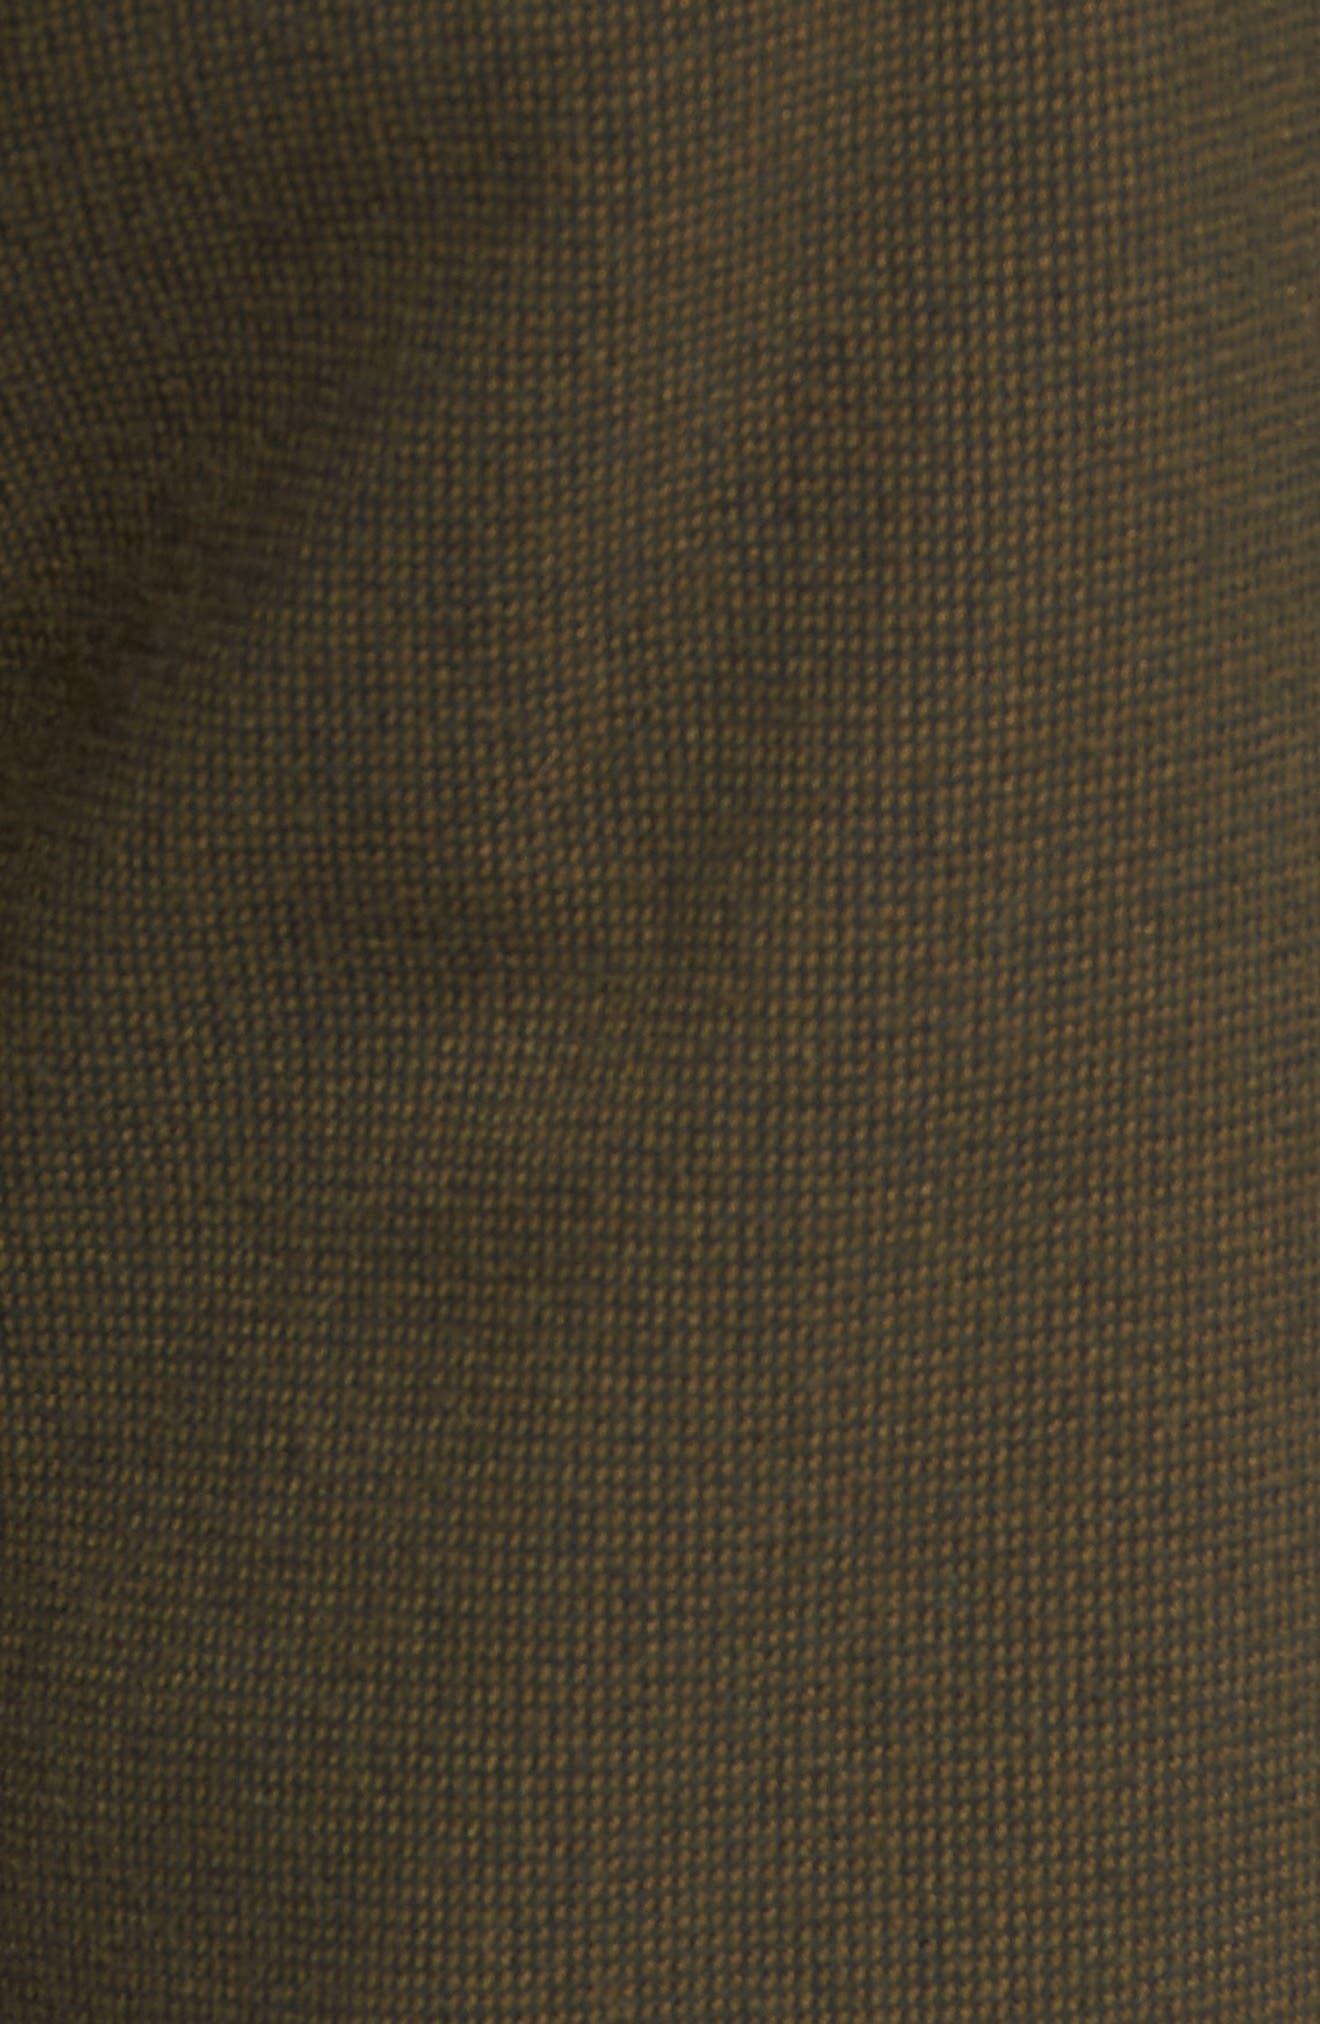 Gritter Thrifter Shorts,                             Alternate thumbnail 5, color,                             GREENTEA